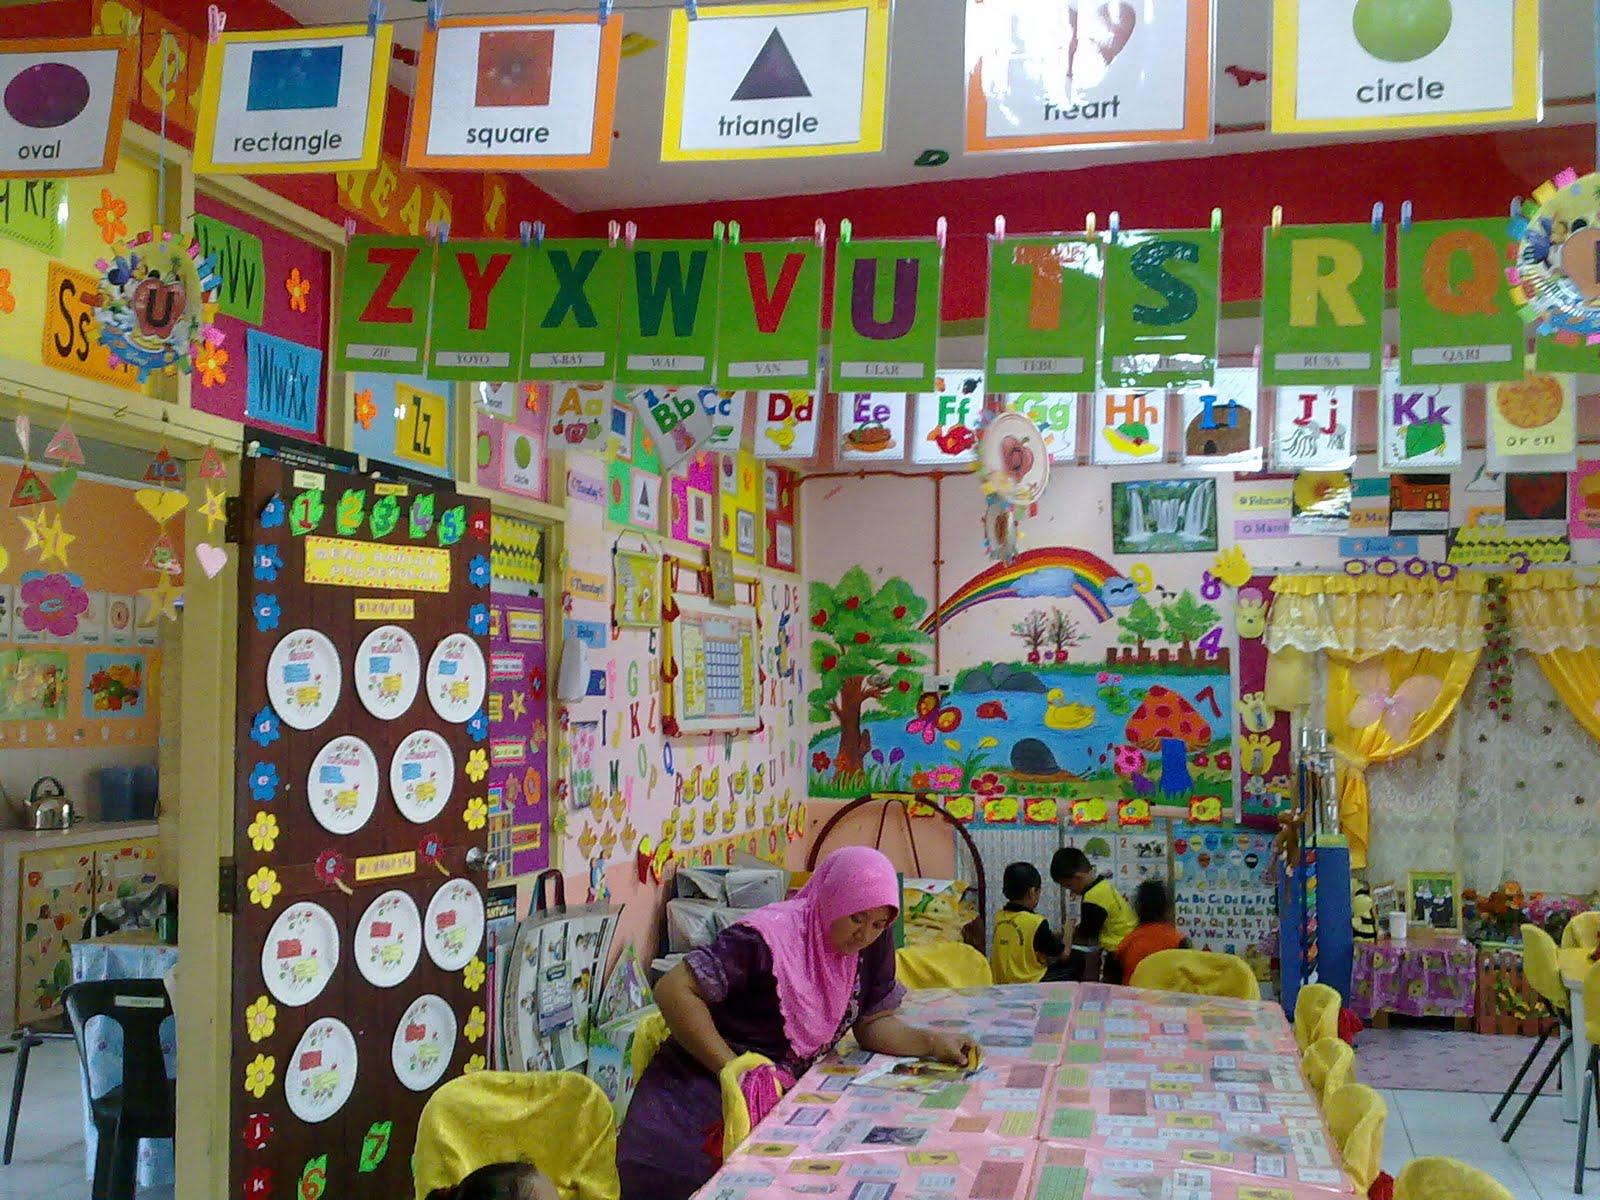 Contoh hiasan di tadika contoh hiasan di tadika for Contoh lukisan mural tadika